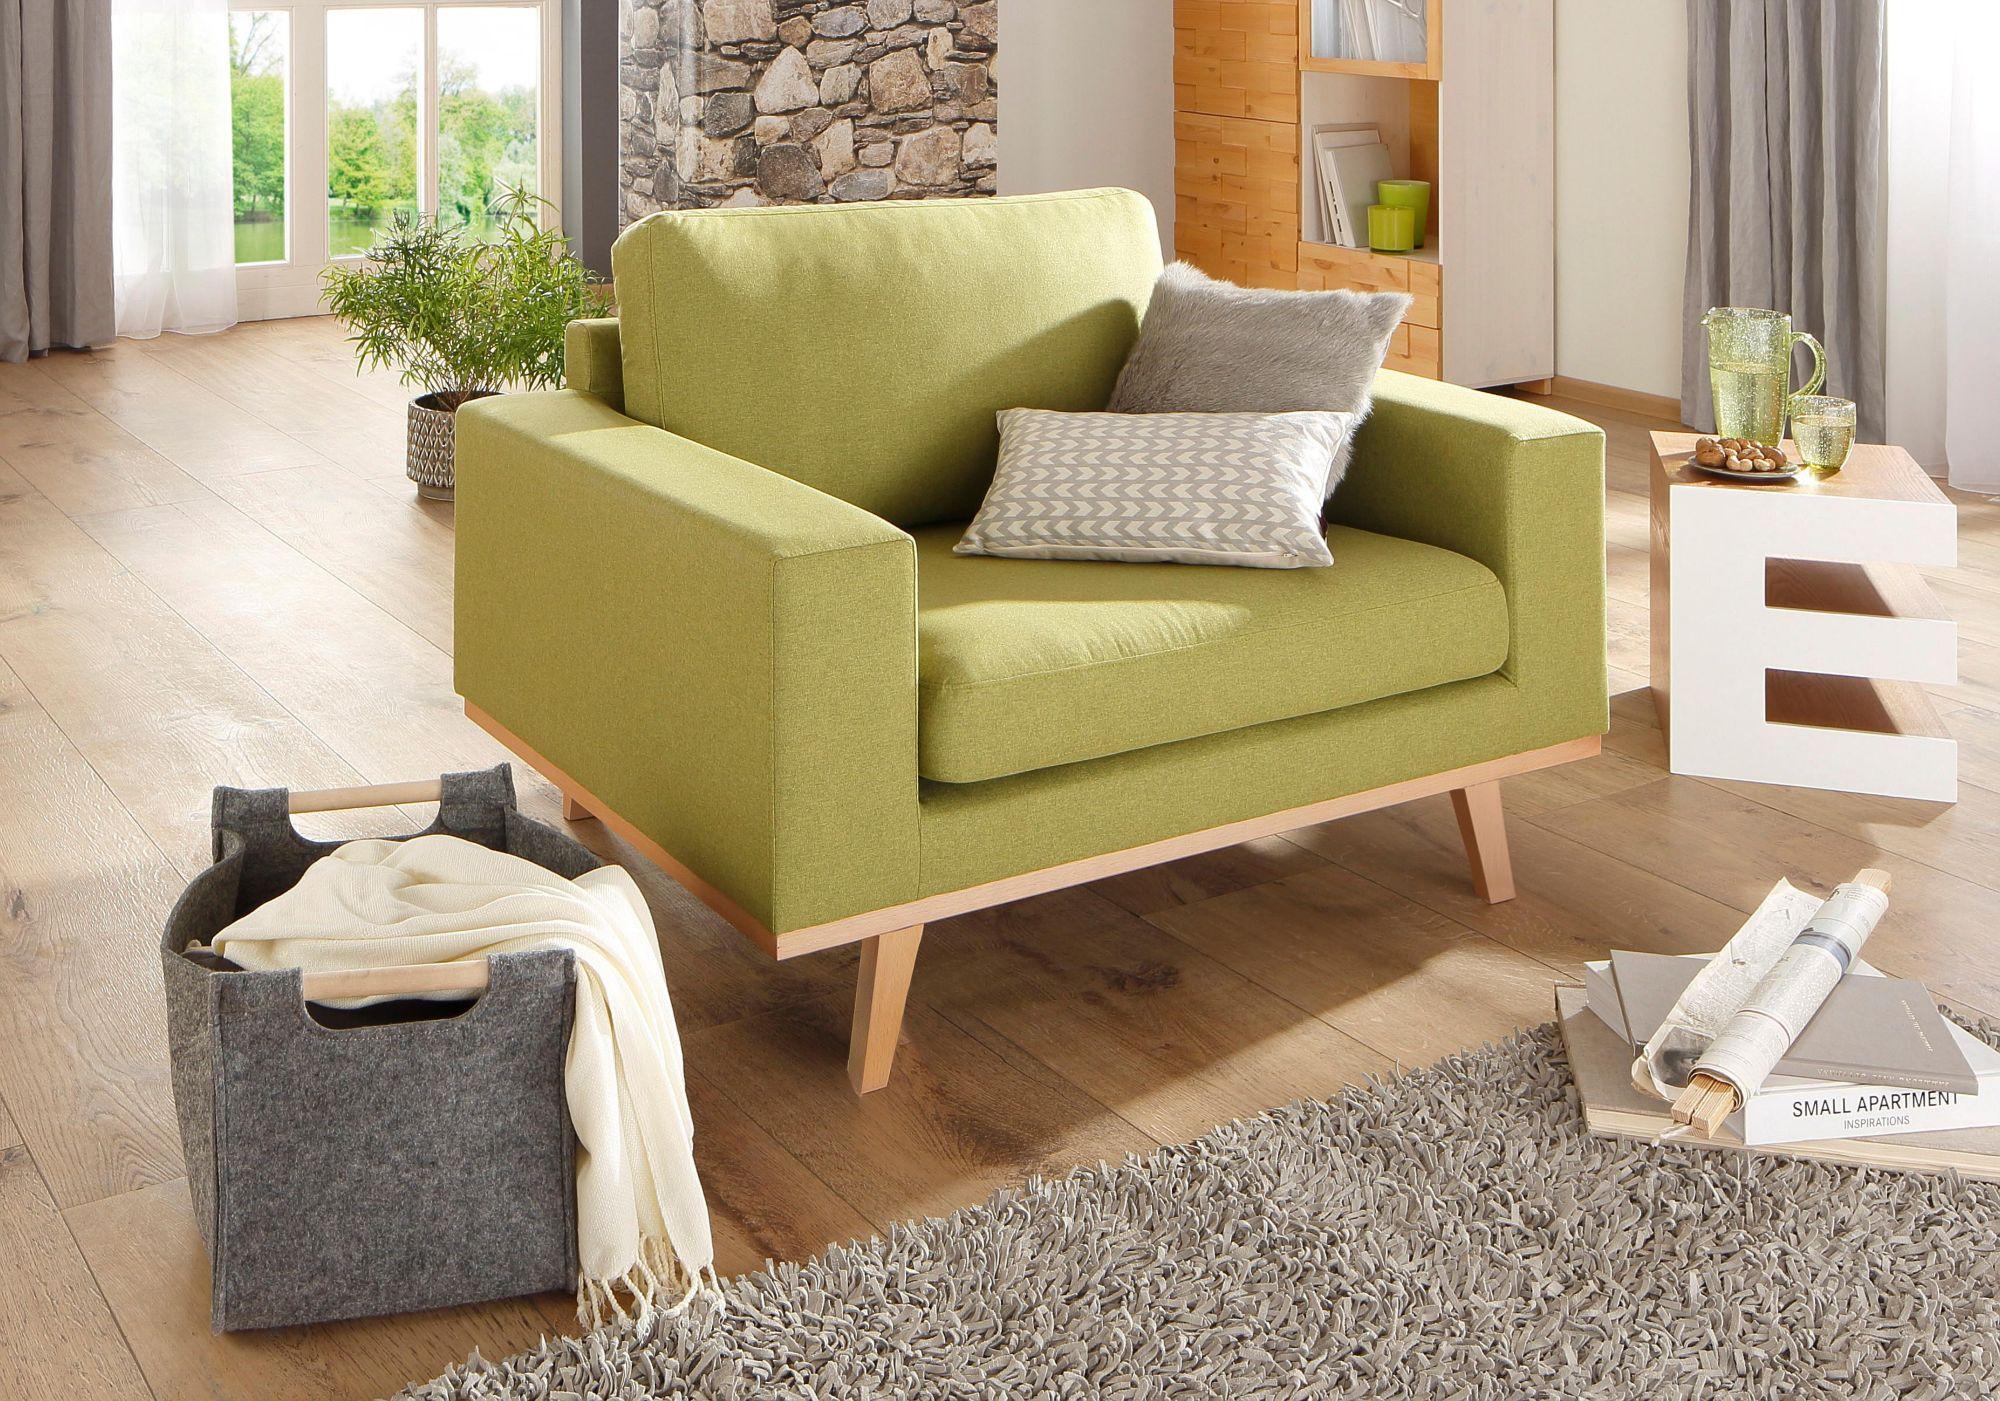 home affaire sessel torino schwab versand sessel. Black Bedroom Furniture Sets. Home Design Ideas